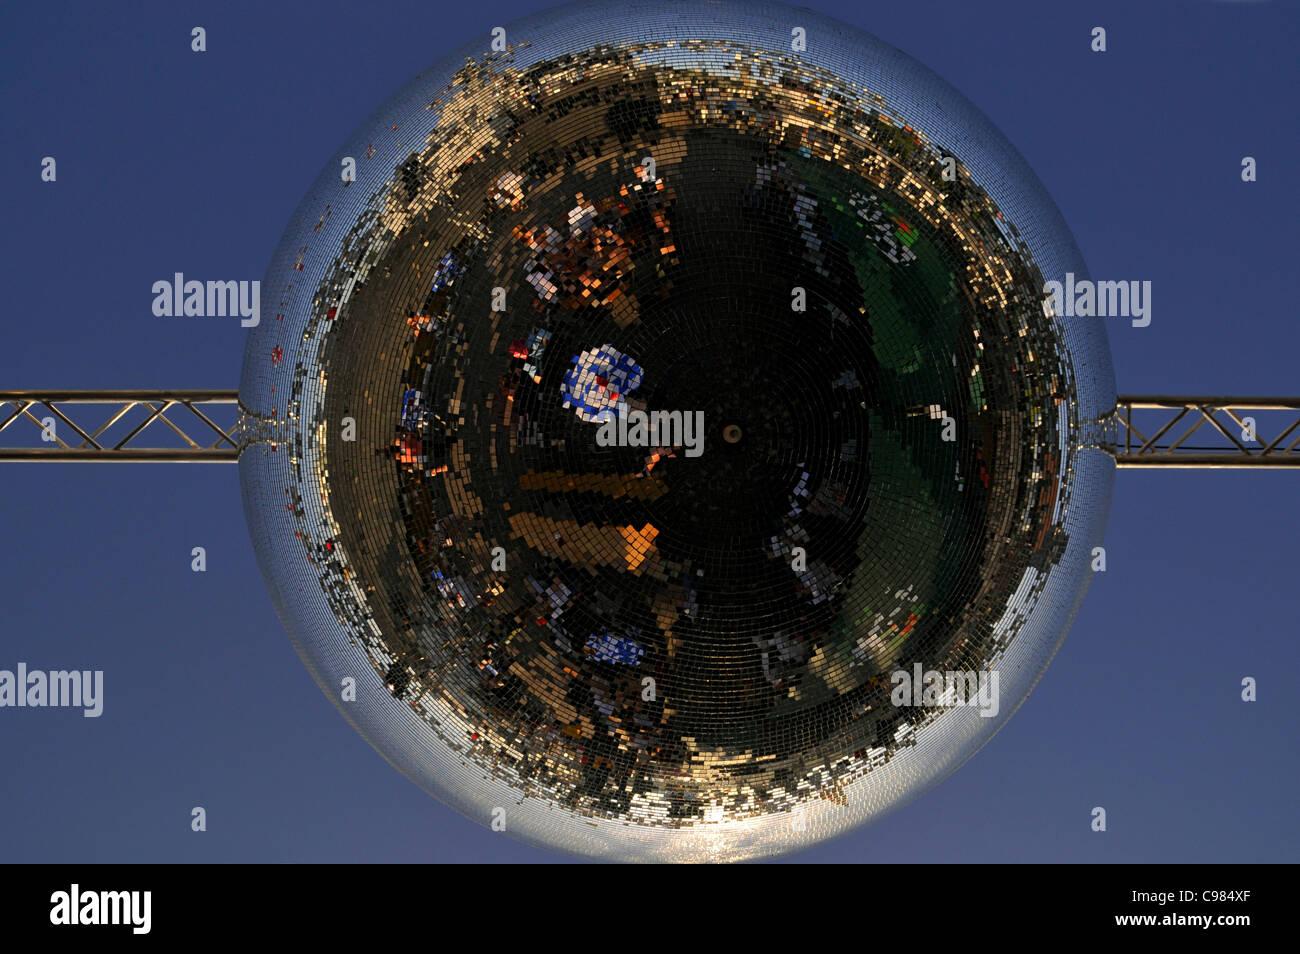 Enormous mirrored disco ball, Port Birthday Celebrations, Port, Hamburg, Germany, Europe - Stock Image